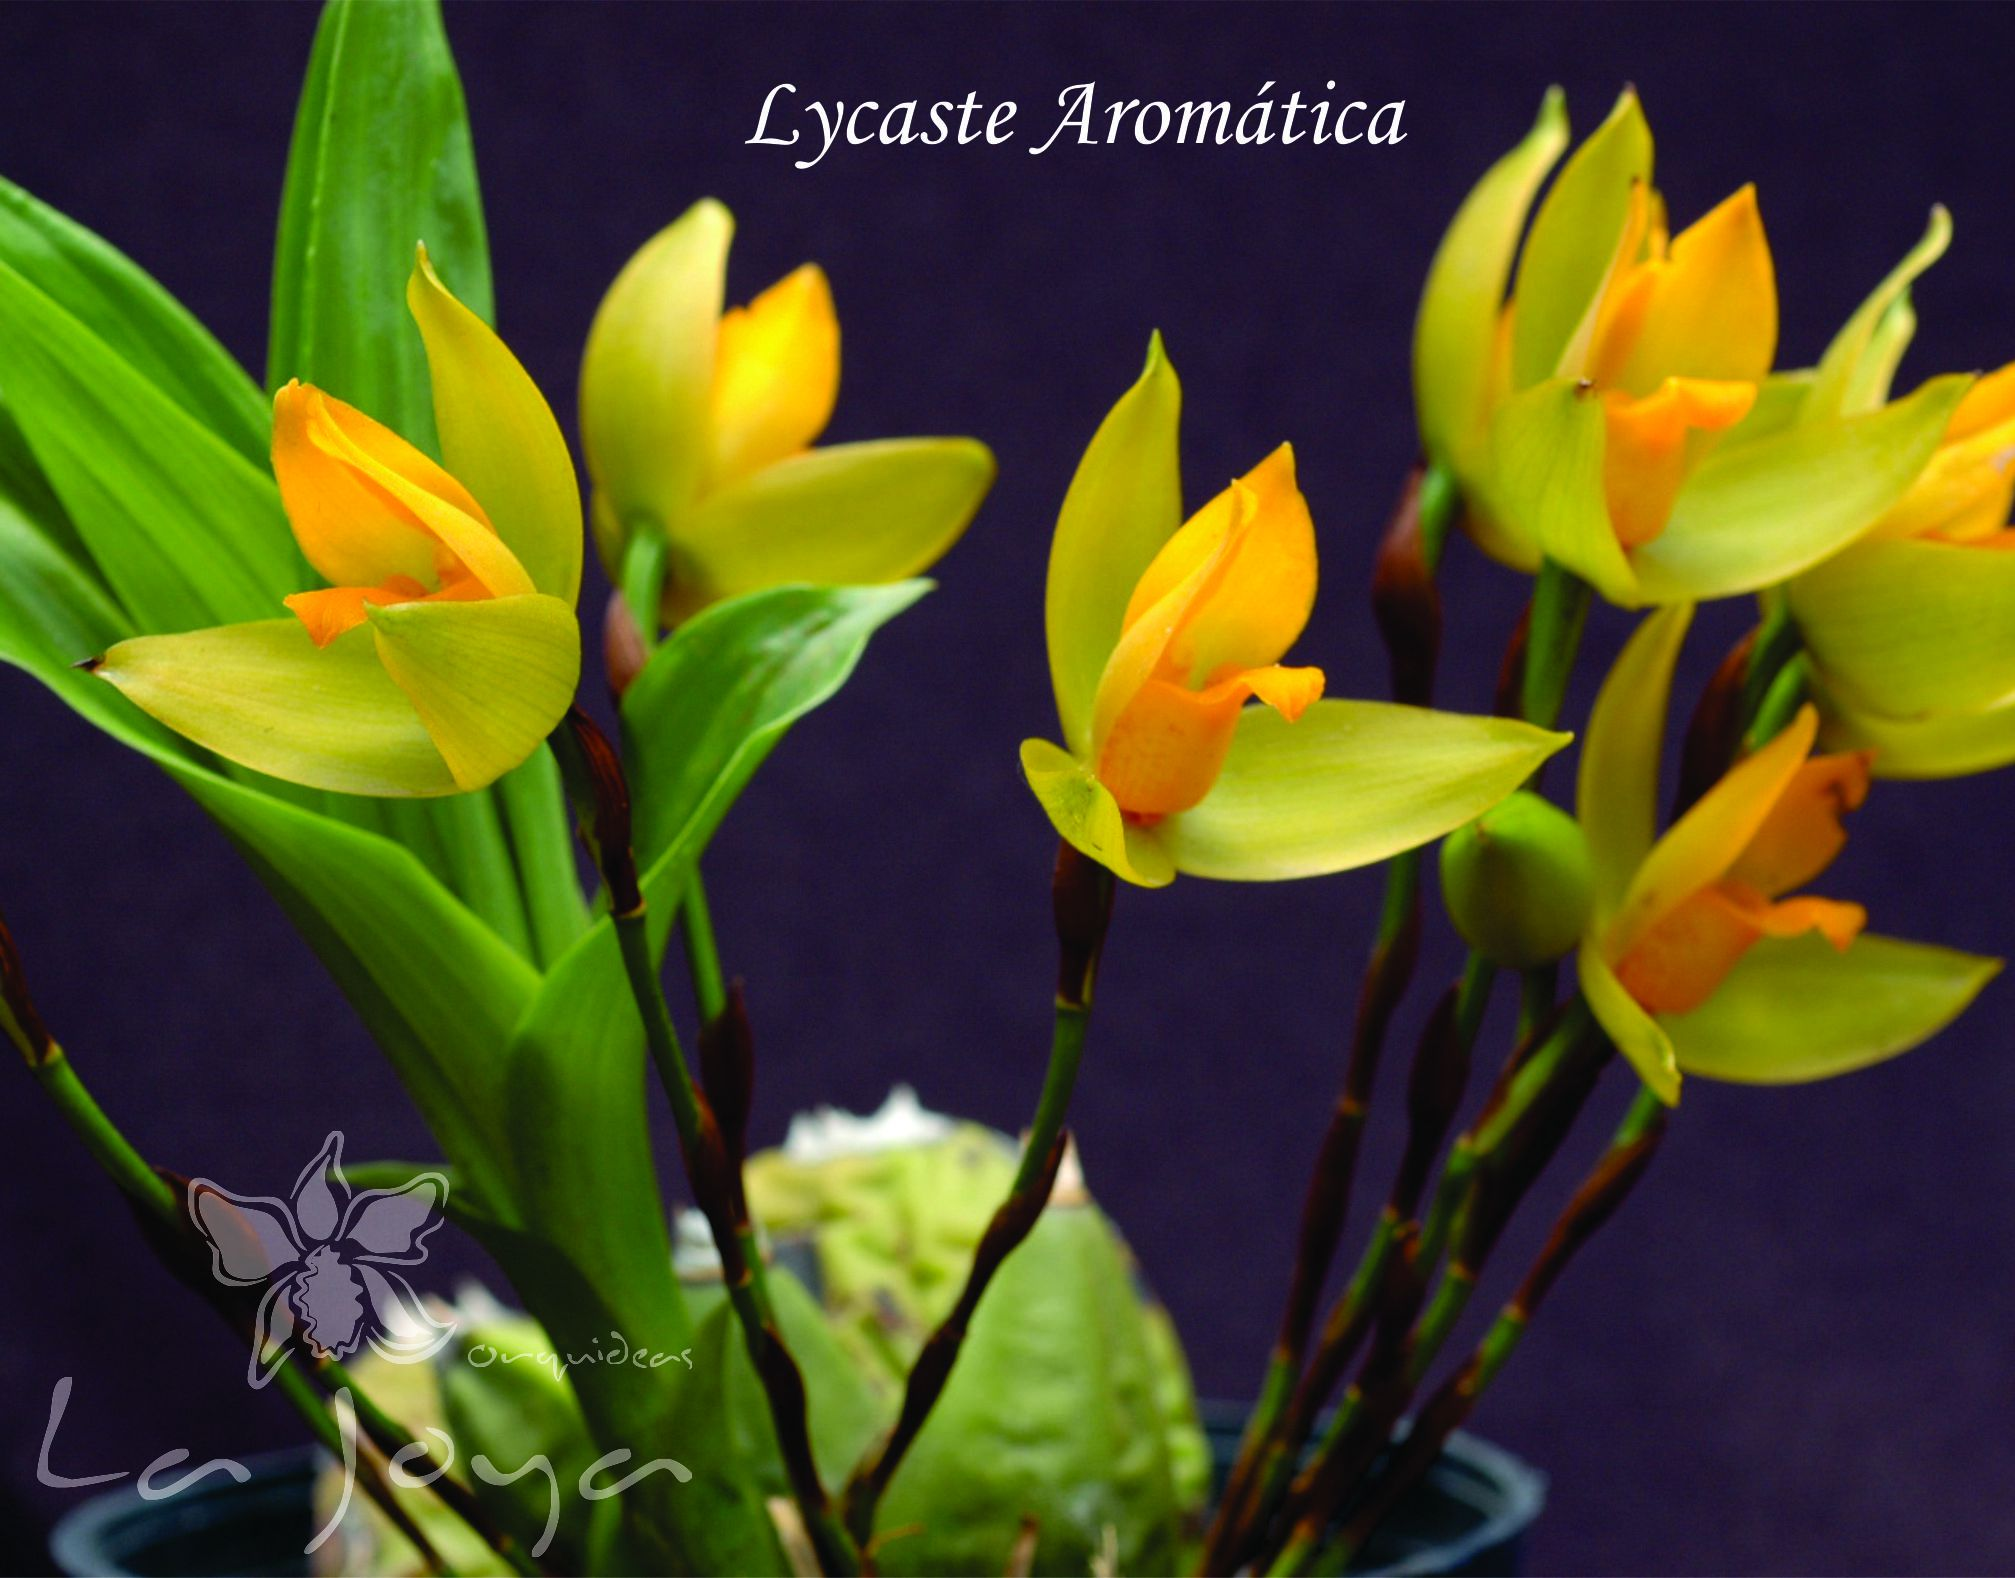 Lycaste Aromatico